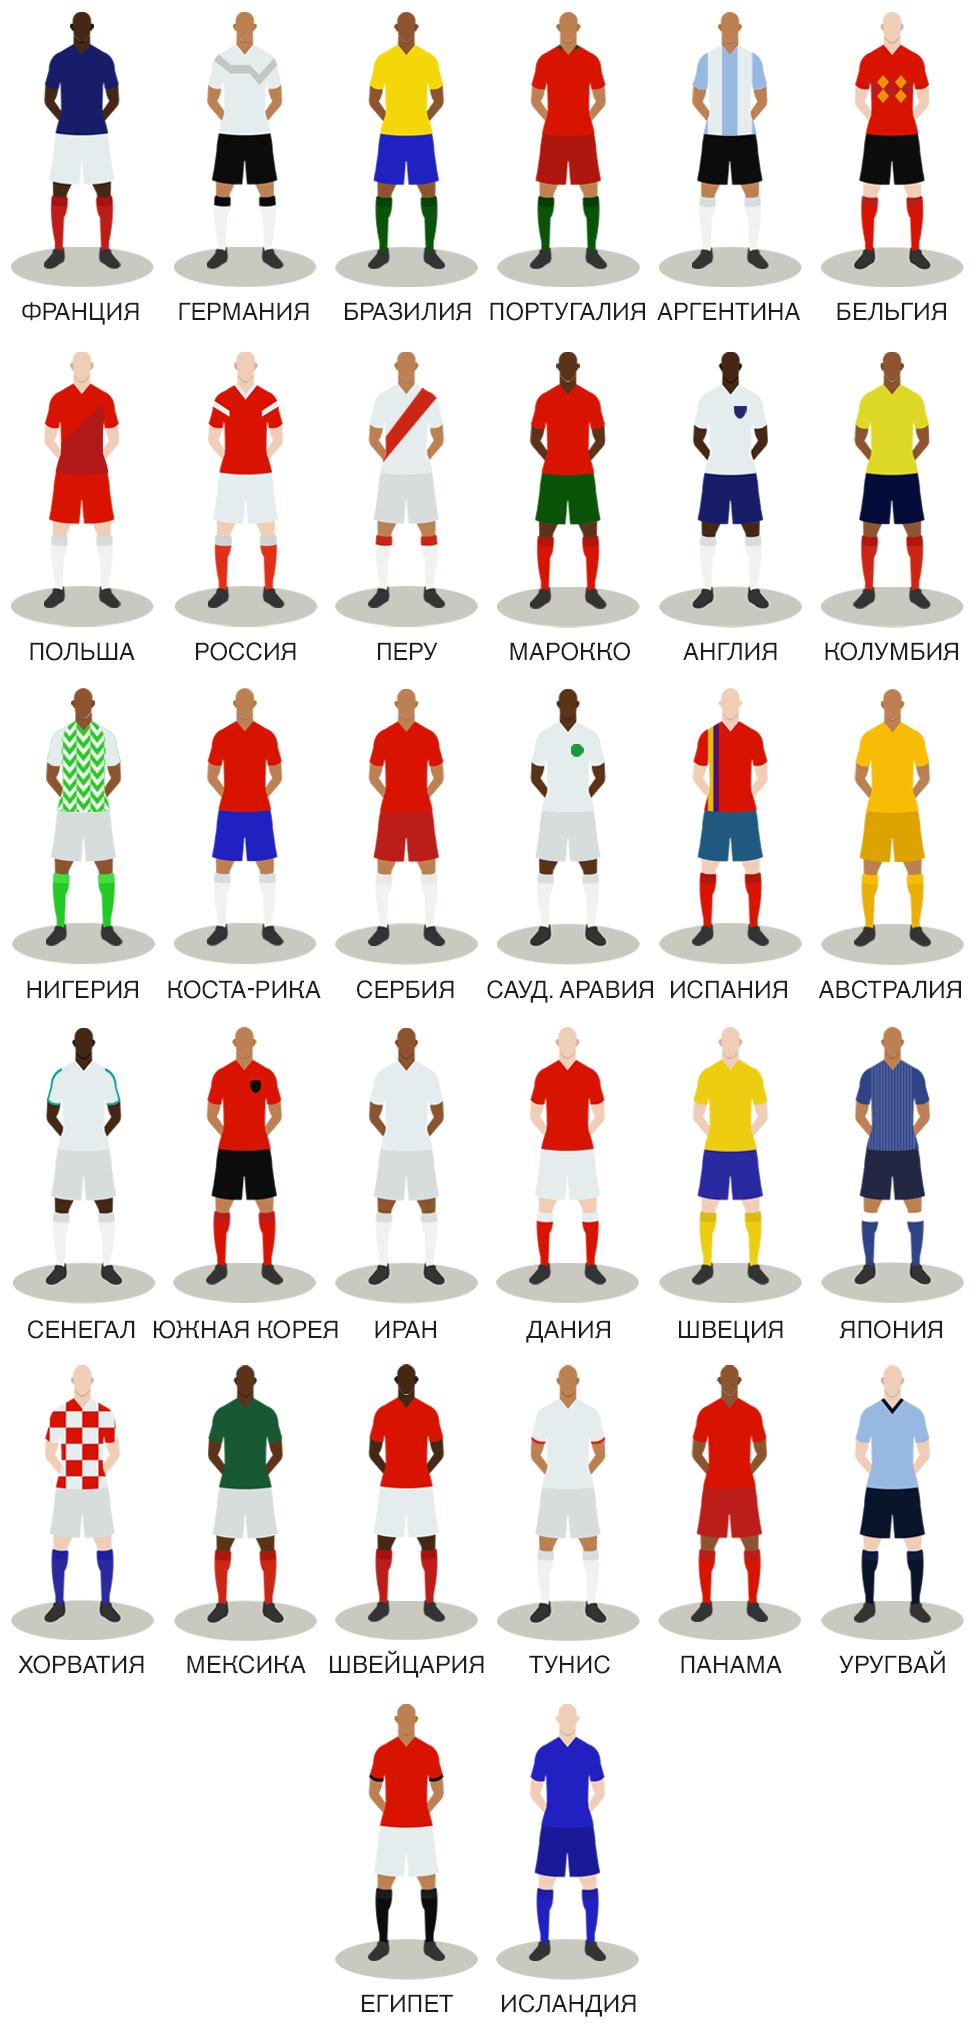 Статистика по футболу англия чемпионат